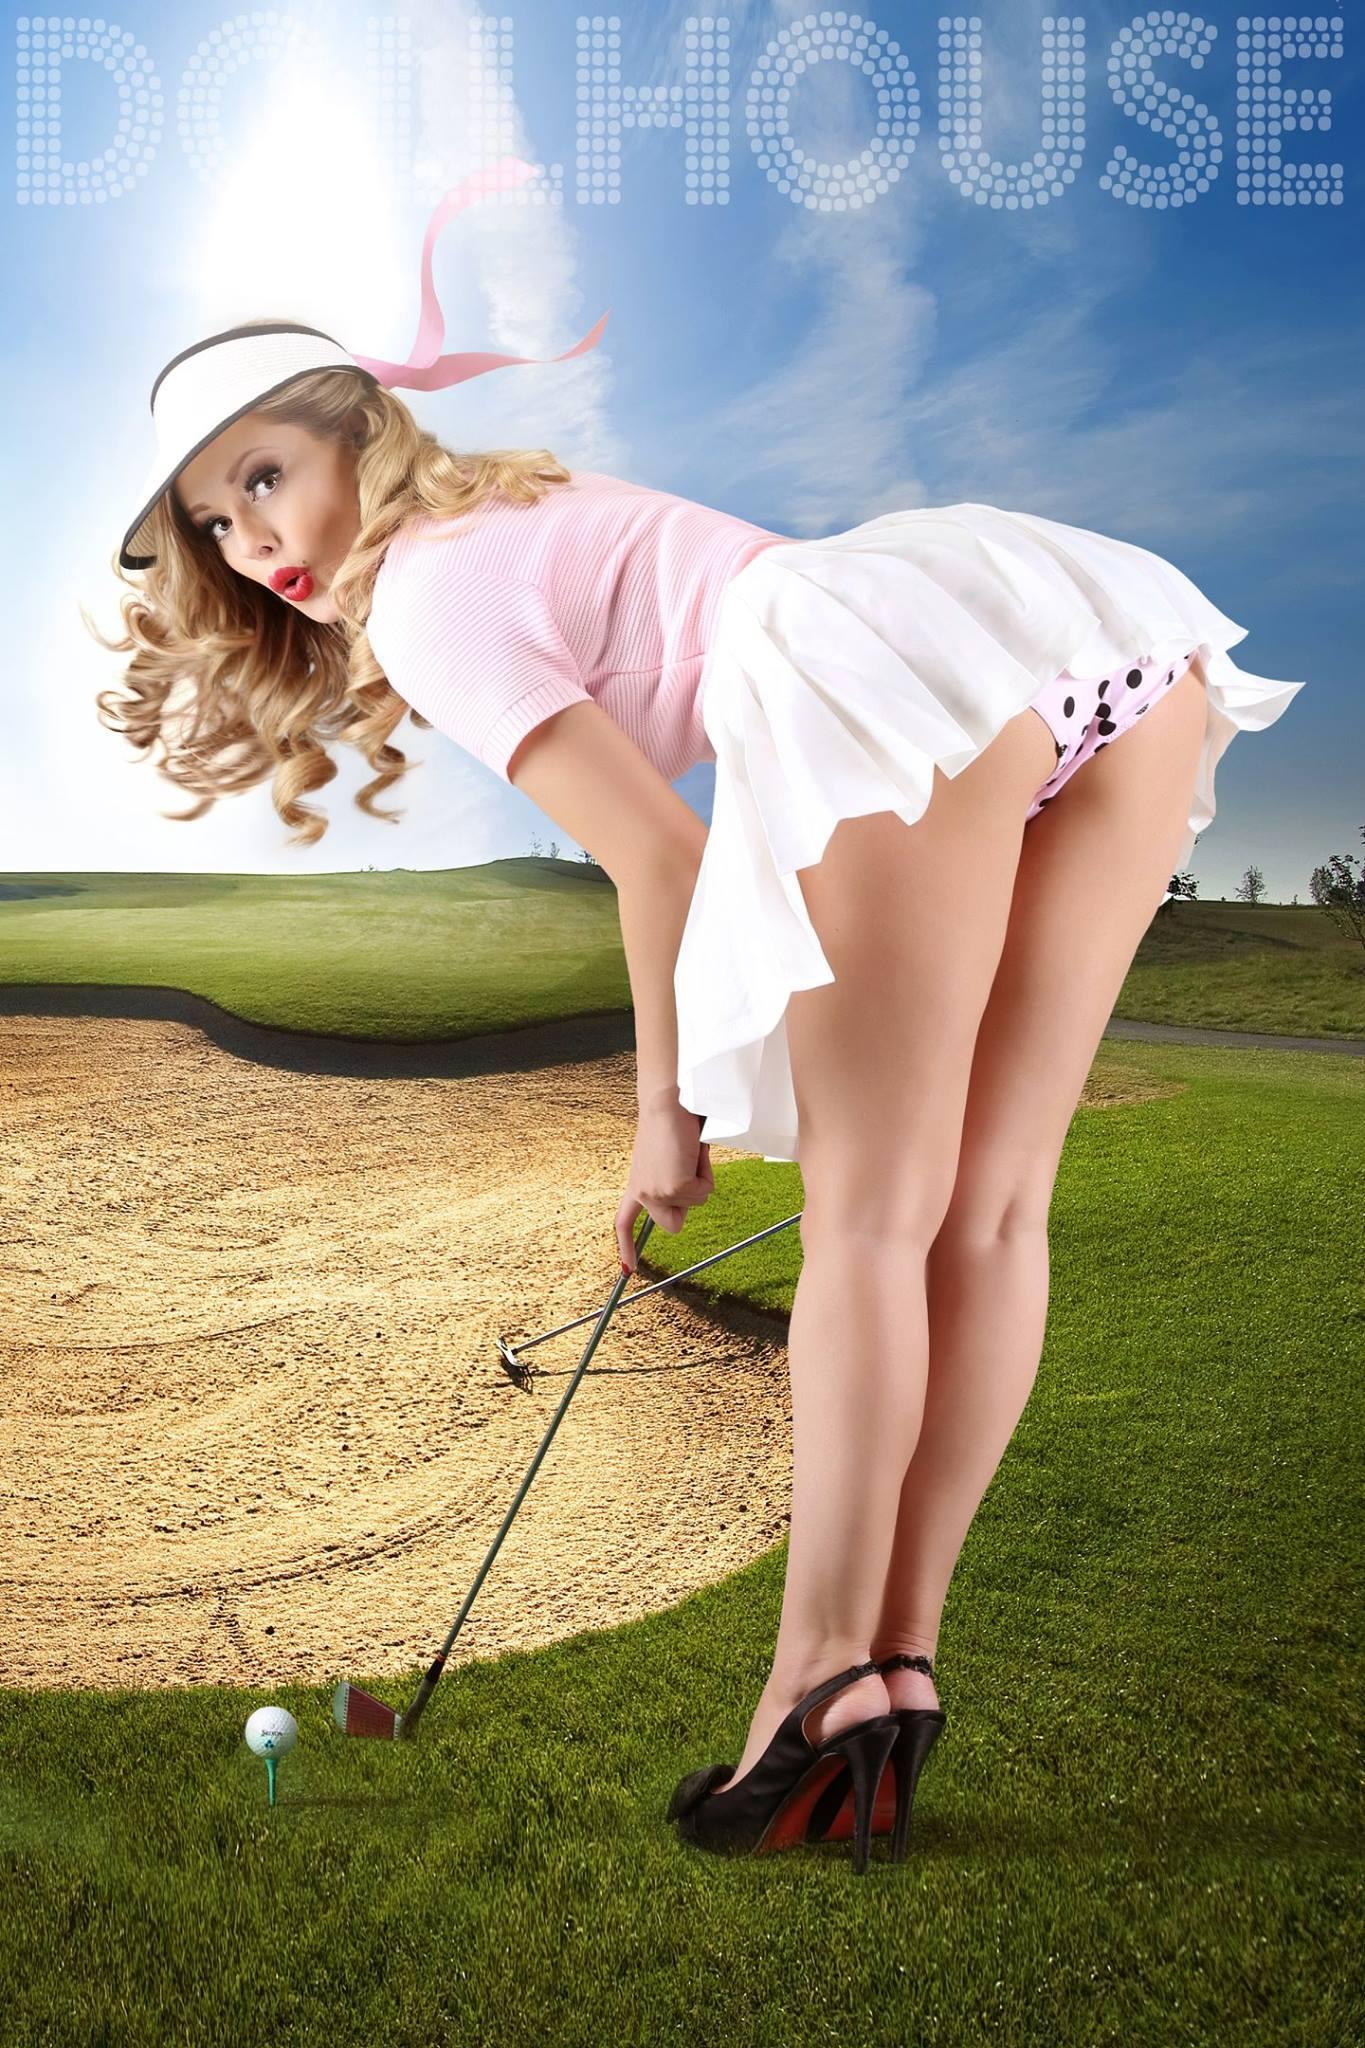 Golf Pin Up Model Heather Valentine